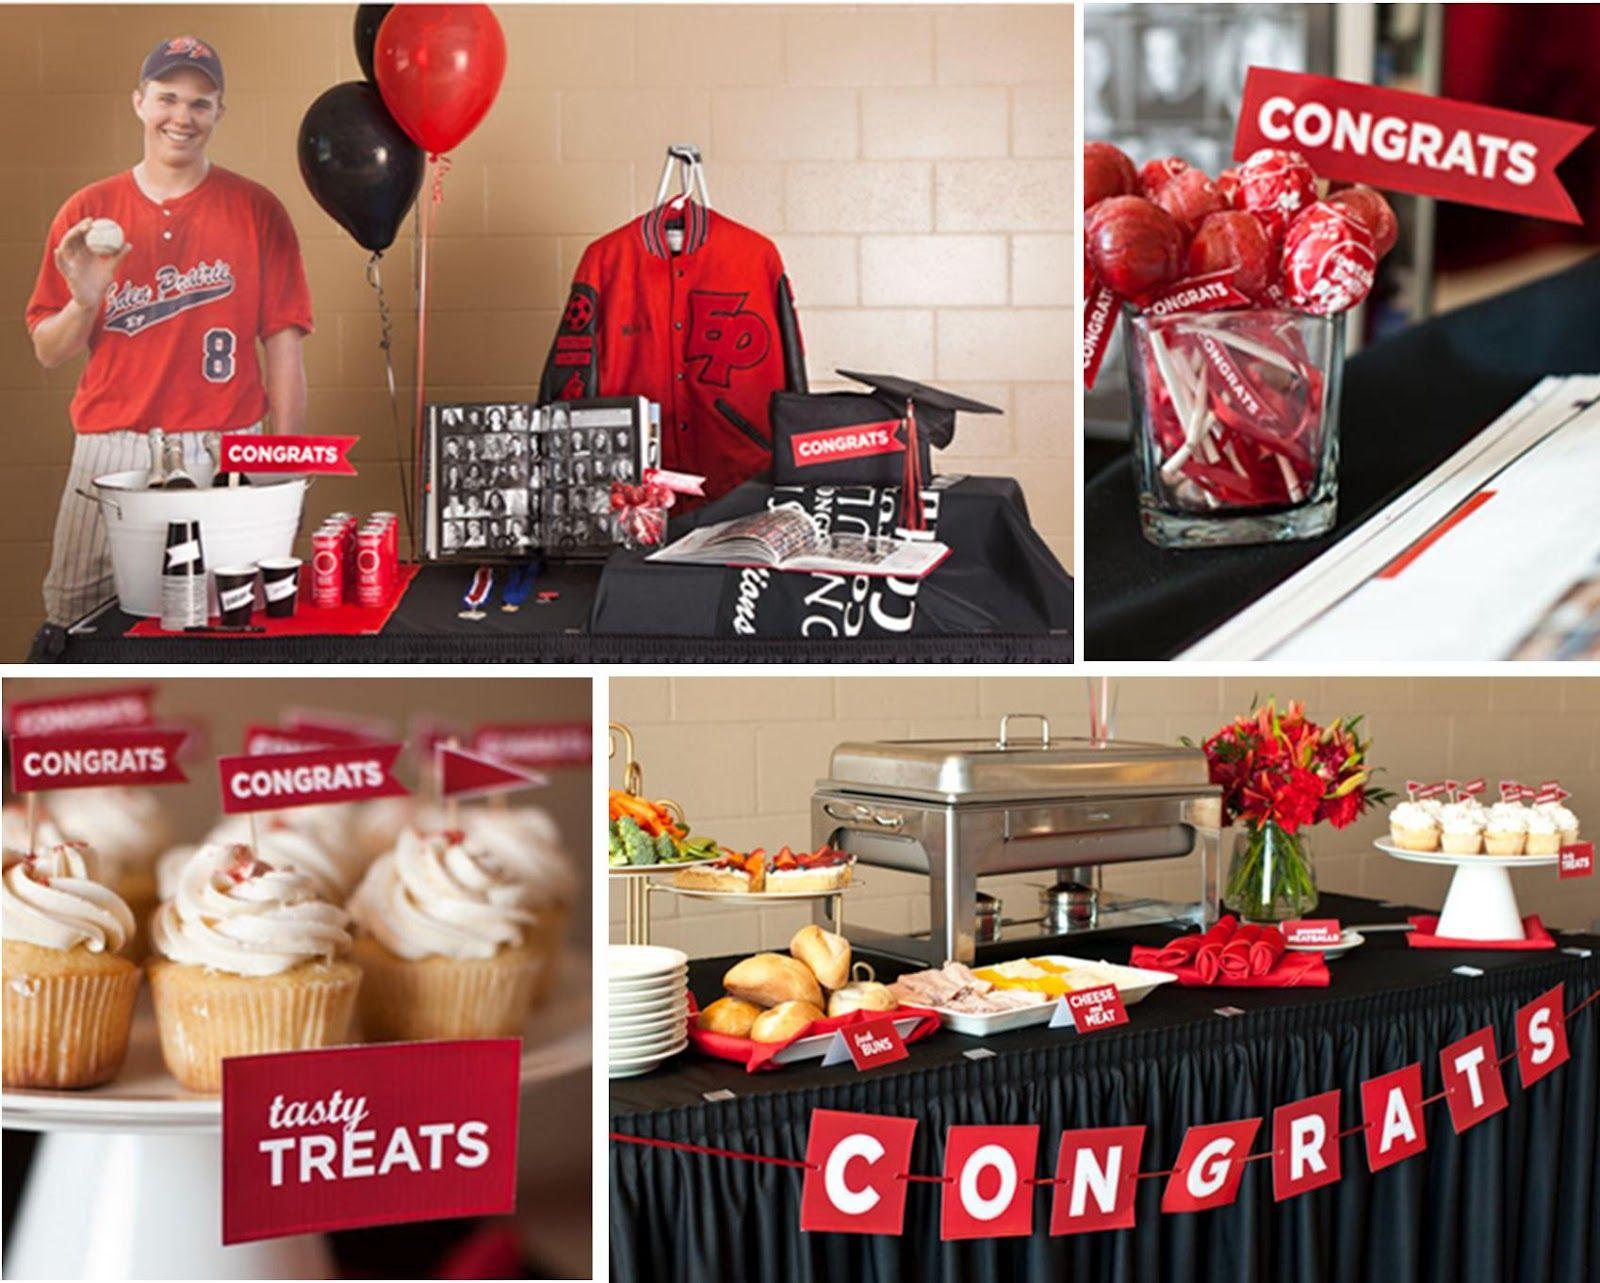 2014 graduation decorations - High School Graduation Party Ideas Classic Grad Latest High School Graduation Party Ideas 2014